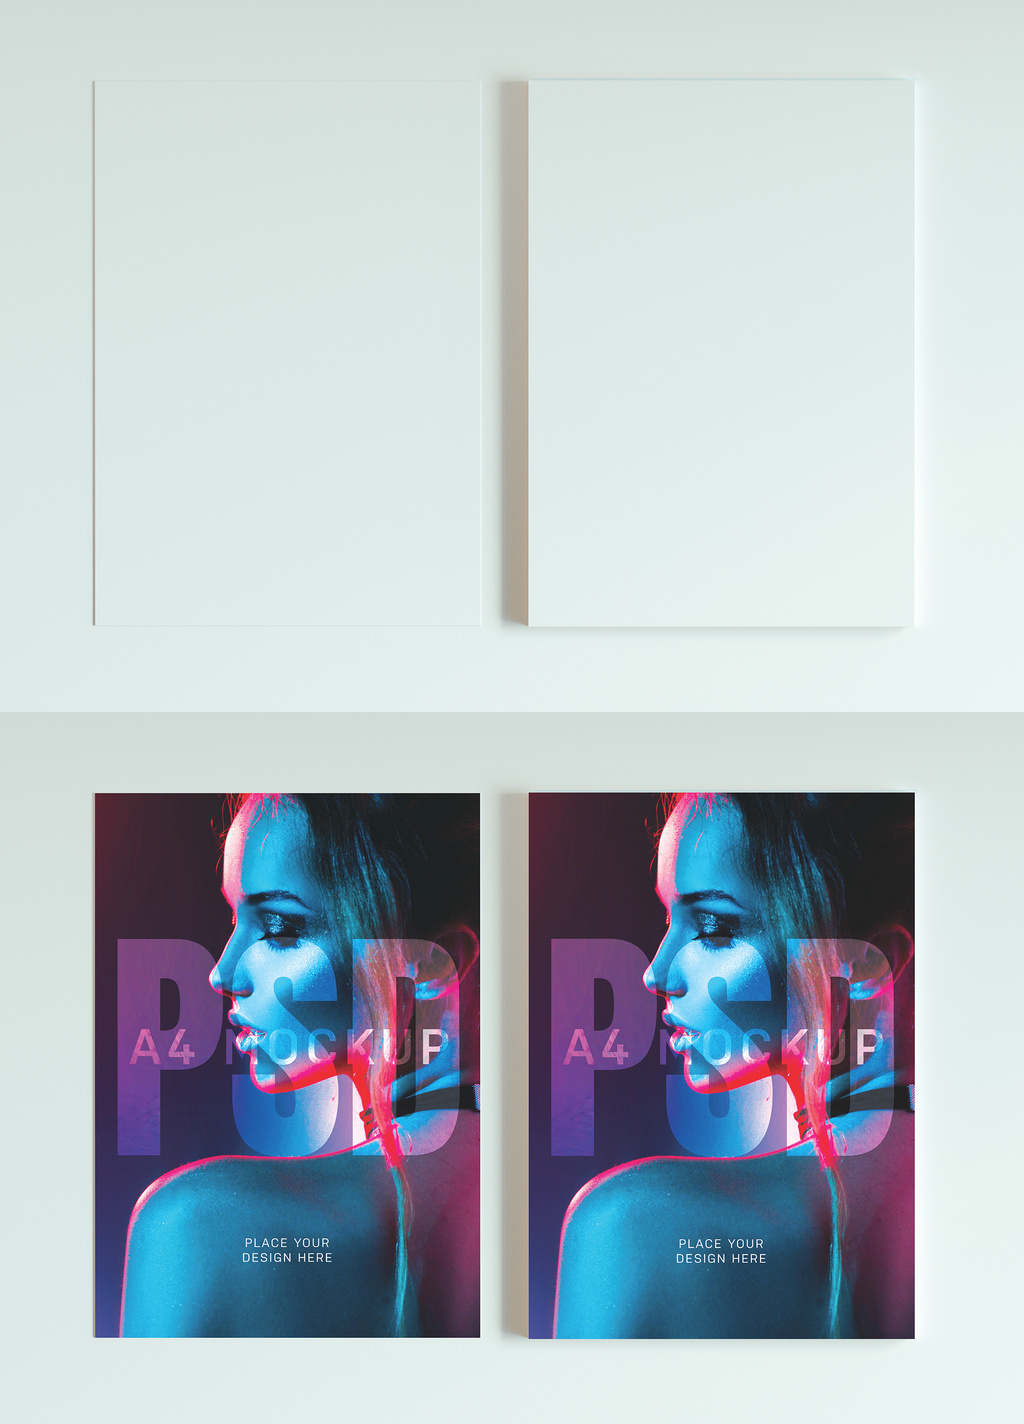 Flyer / A4 Paper Mockup